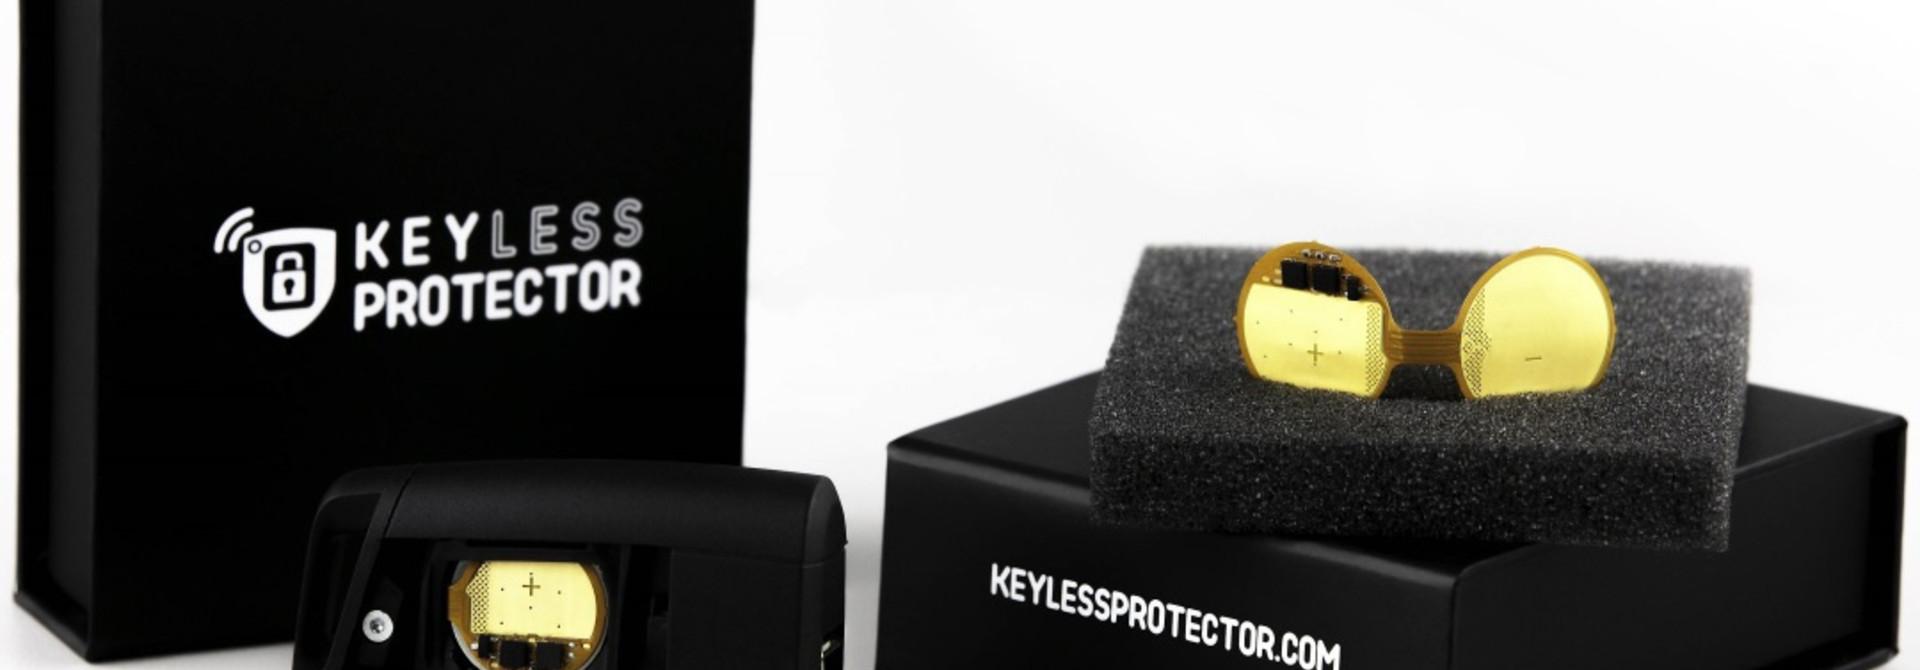 Keyless Protector nu officieel KE01 gecertificeerd